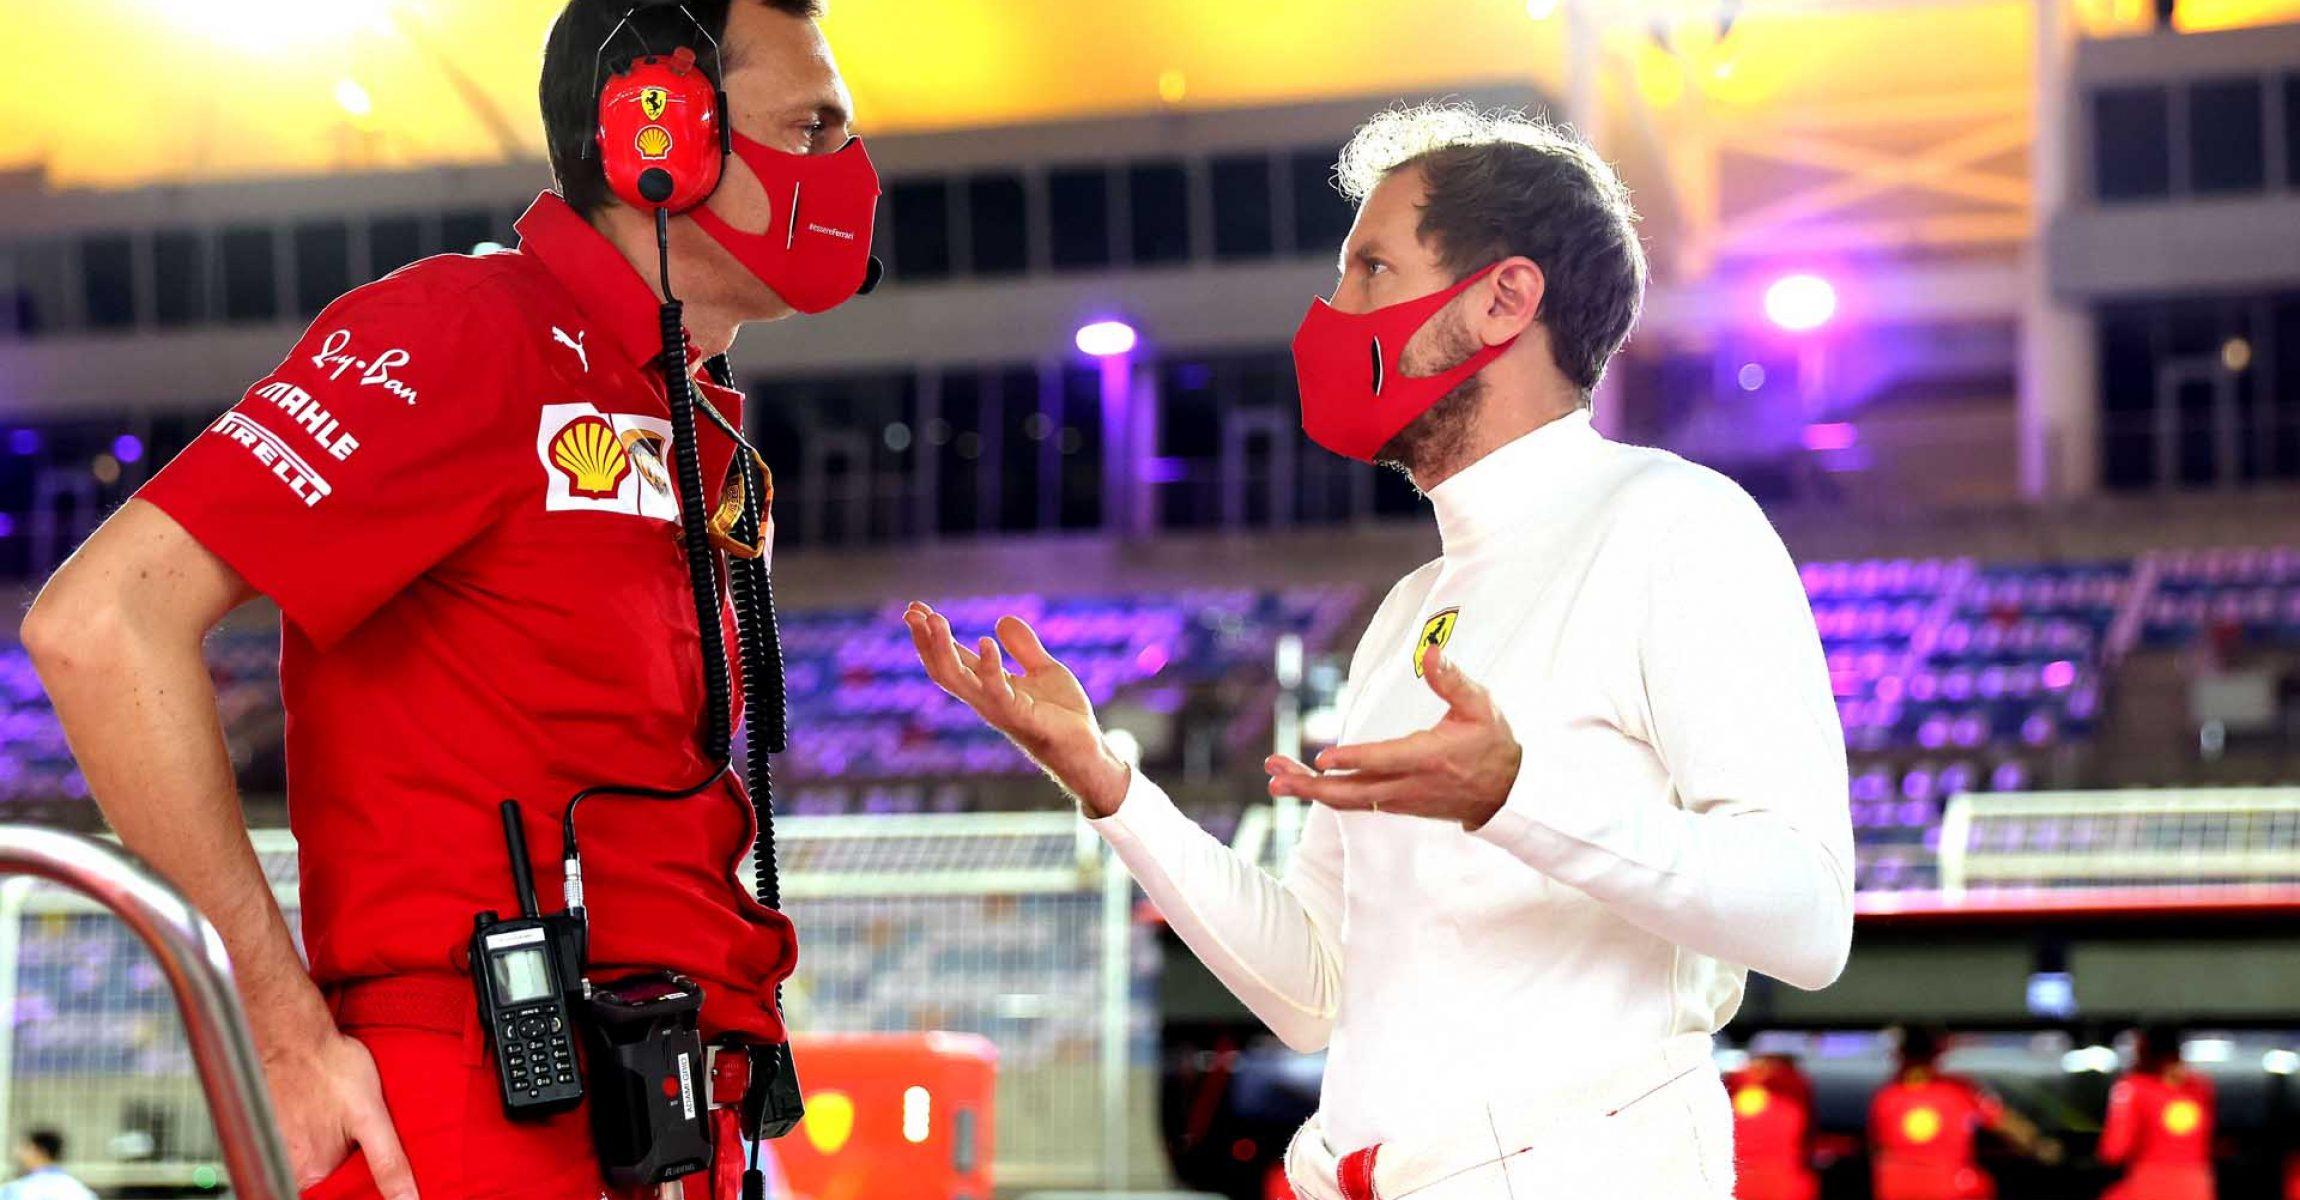 GP SAKHIR  F1/2020 - VENERDÌ 04/12/2020      credit: @Scuderia Ferrari Press Office Sebastian Vettel